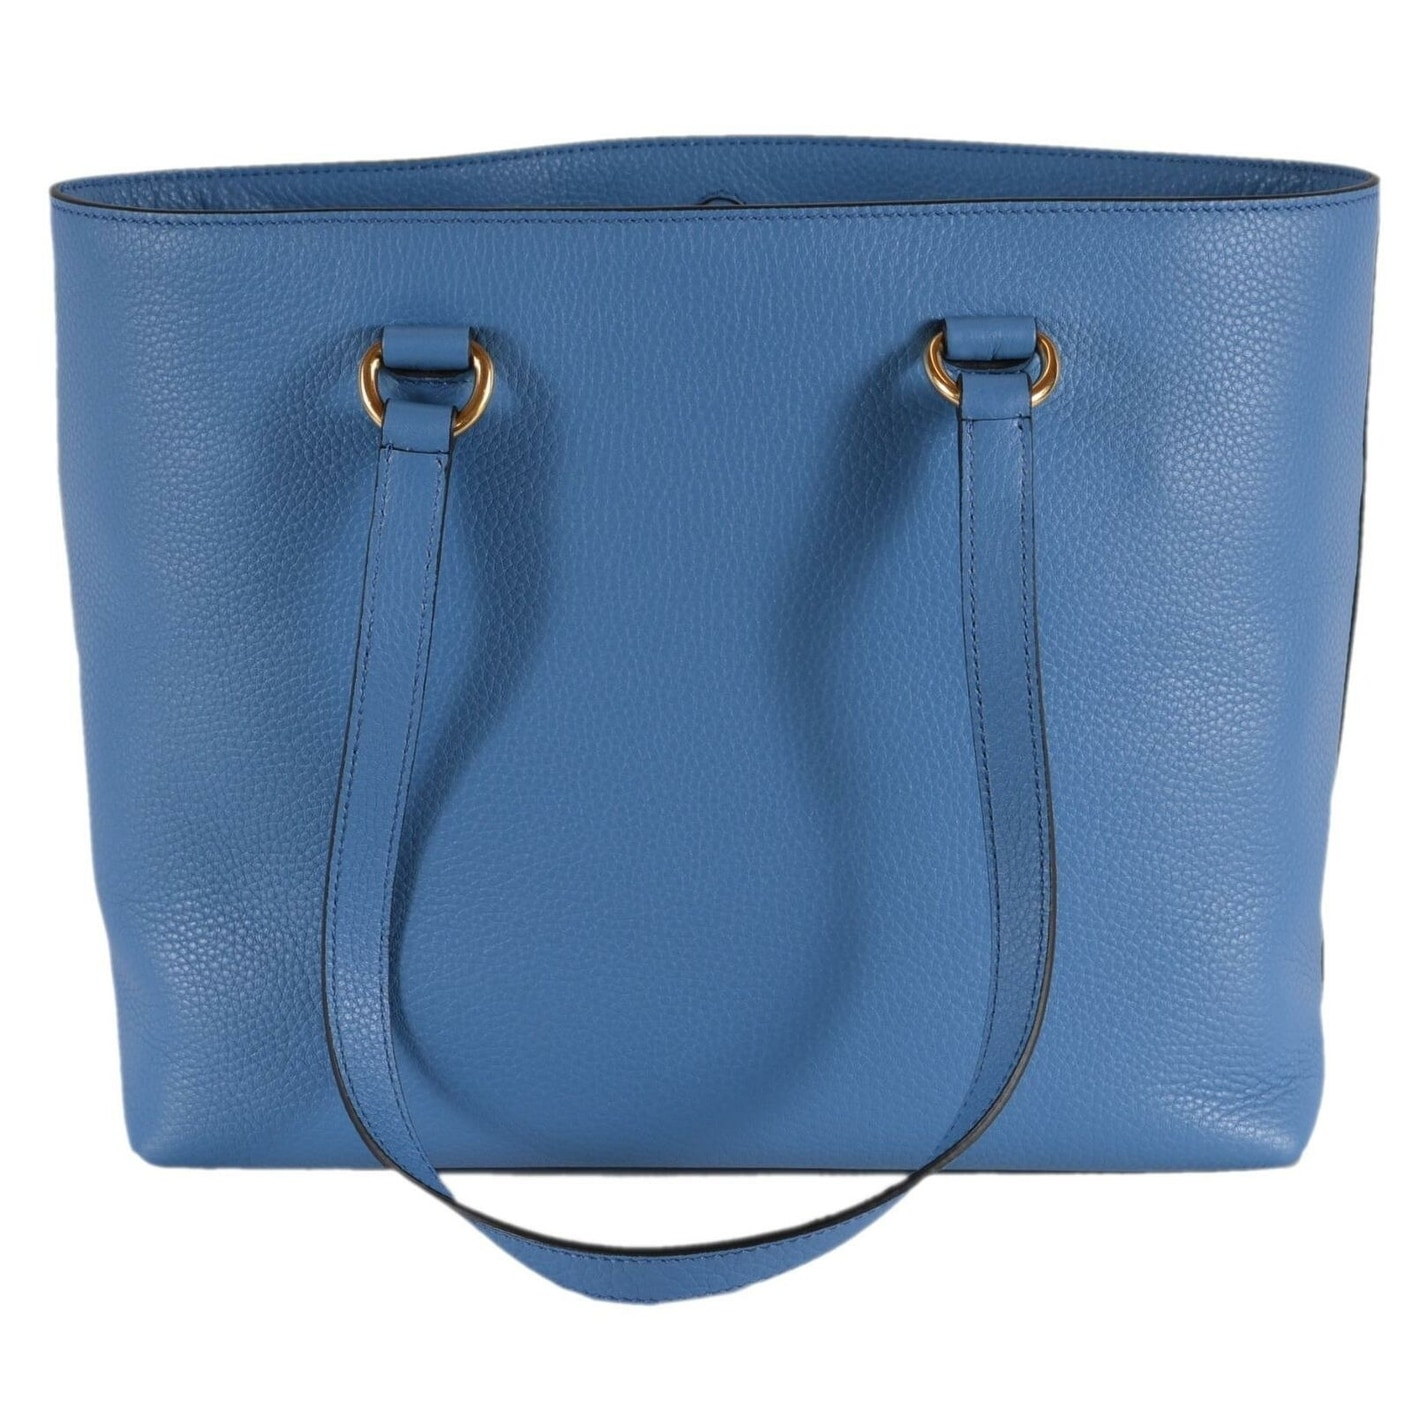 2ddf6bf183a983 Prada 1BG100 Mare Blue Leather Vitello Phenix Embossed Logo Shopper Purse